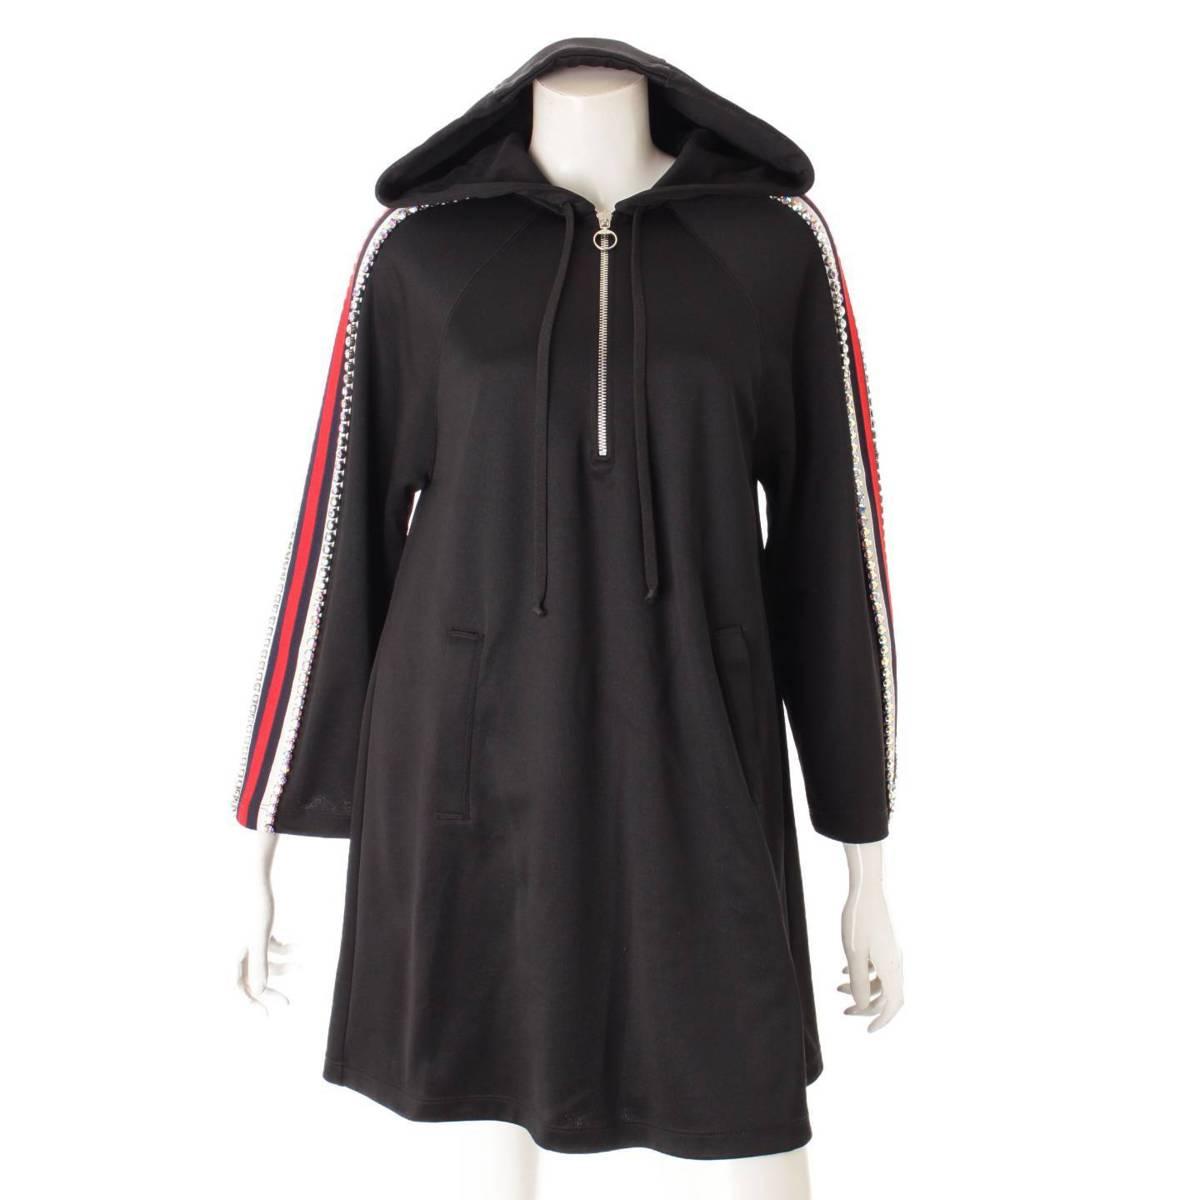 【10%OFFセール】【グッチ】Gucci 18SS オーバーサイズ クリスタル フード ジャージ ショートドレス ブラック XS 未使用【中古】【鑑定済・正規品保証】79152